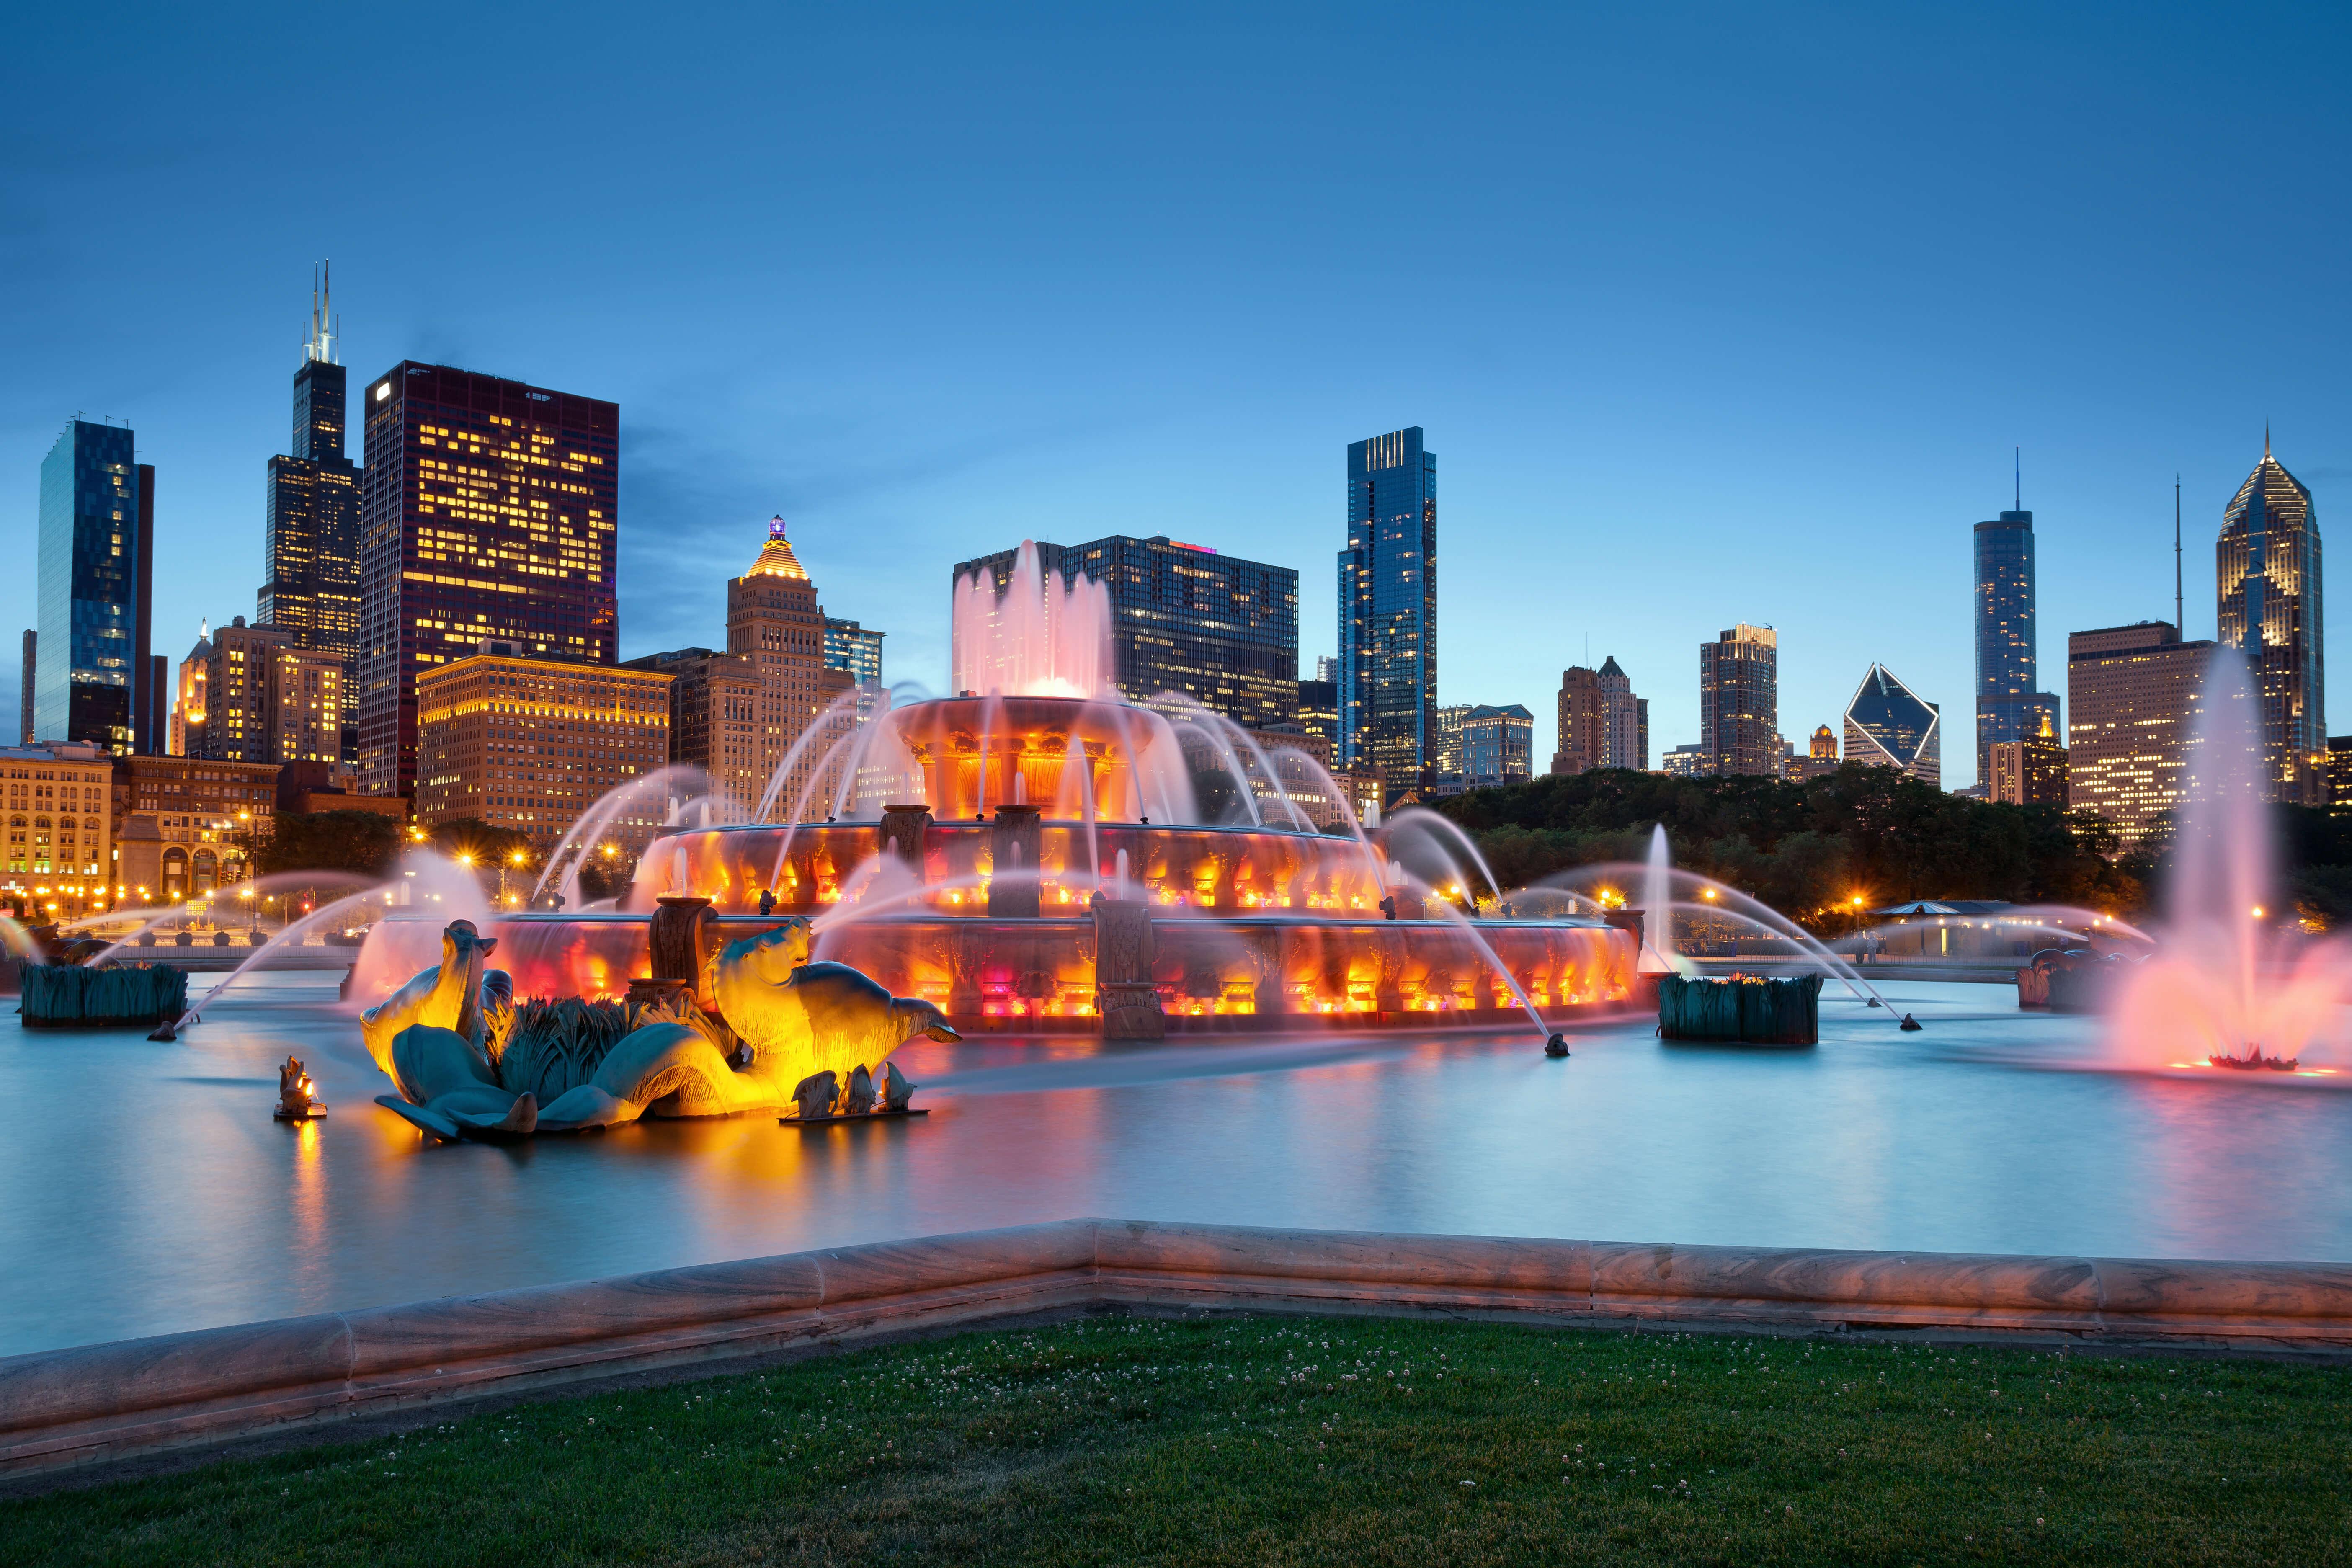 Chicago_105235997